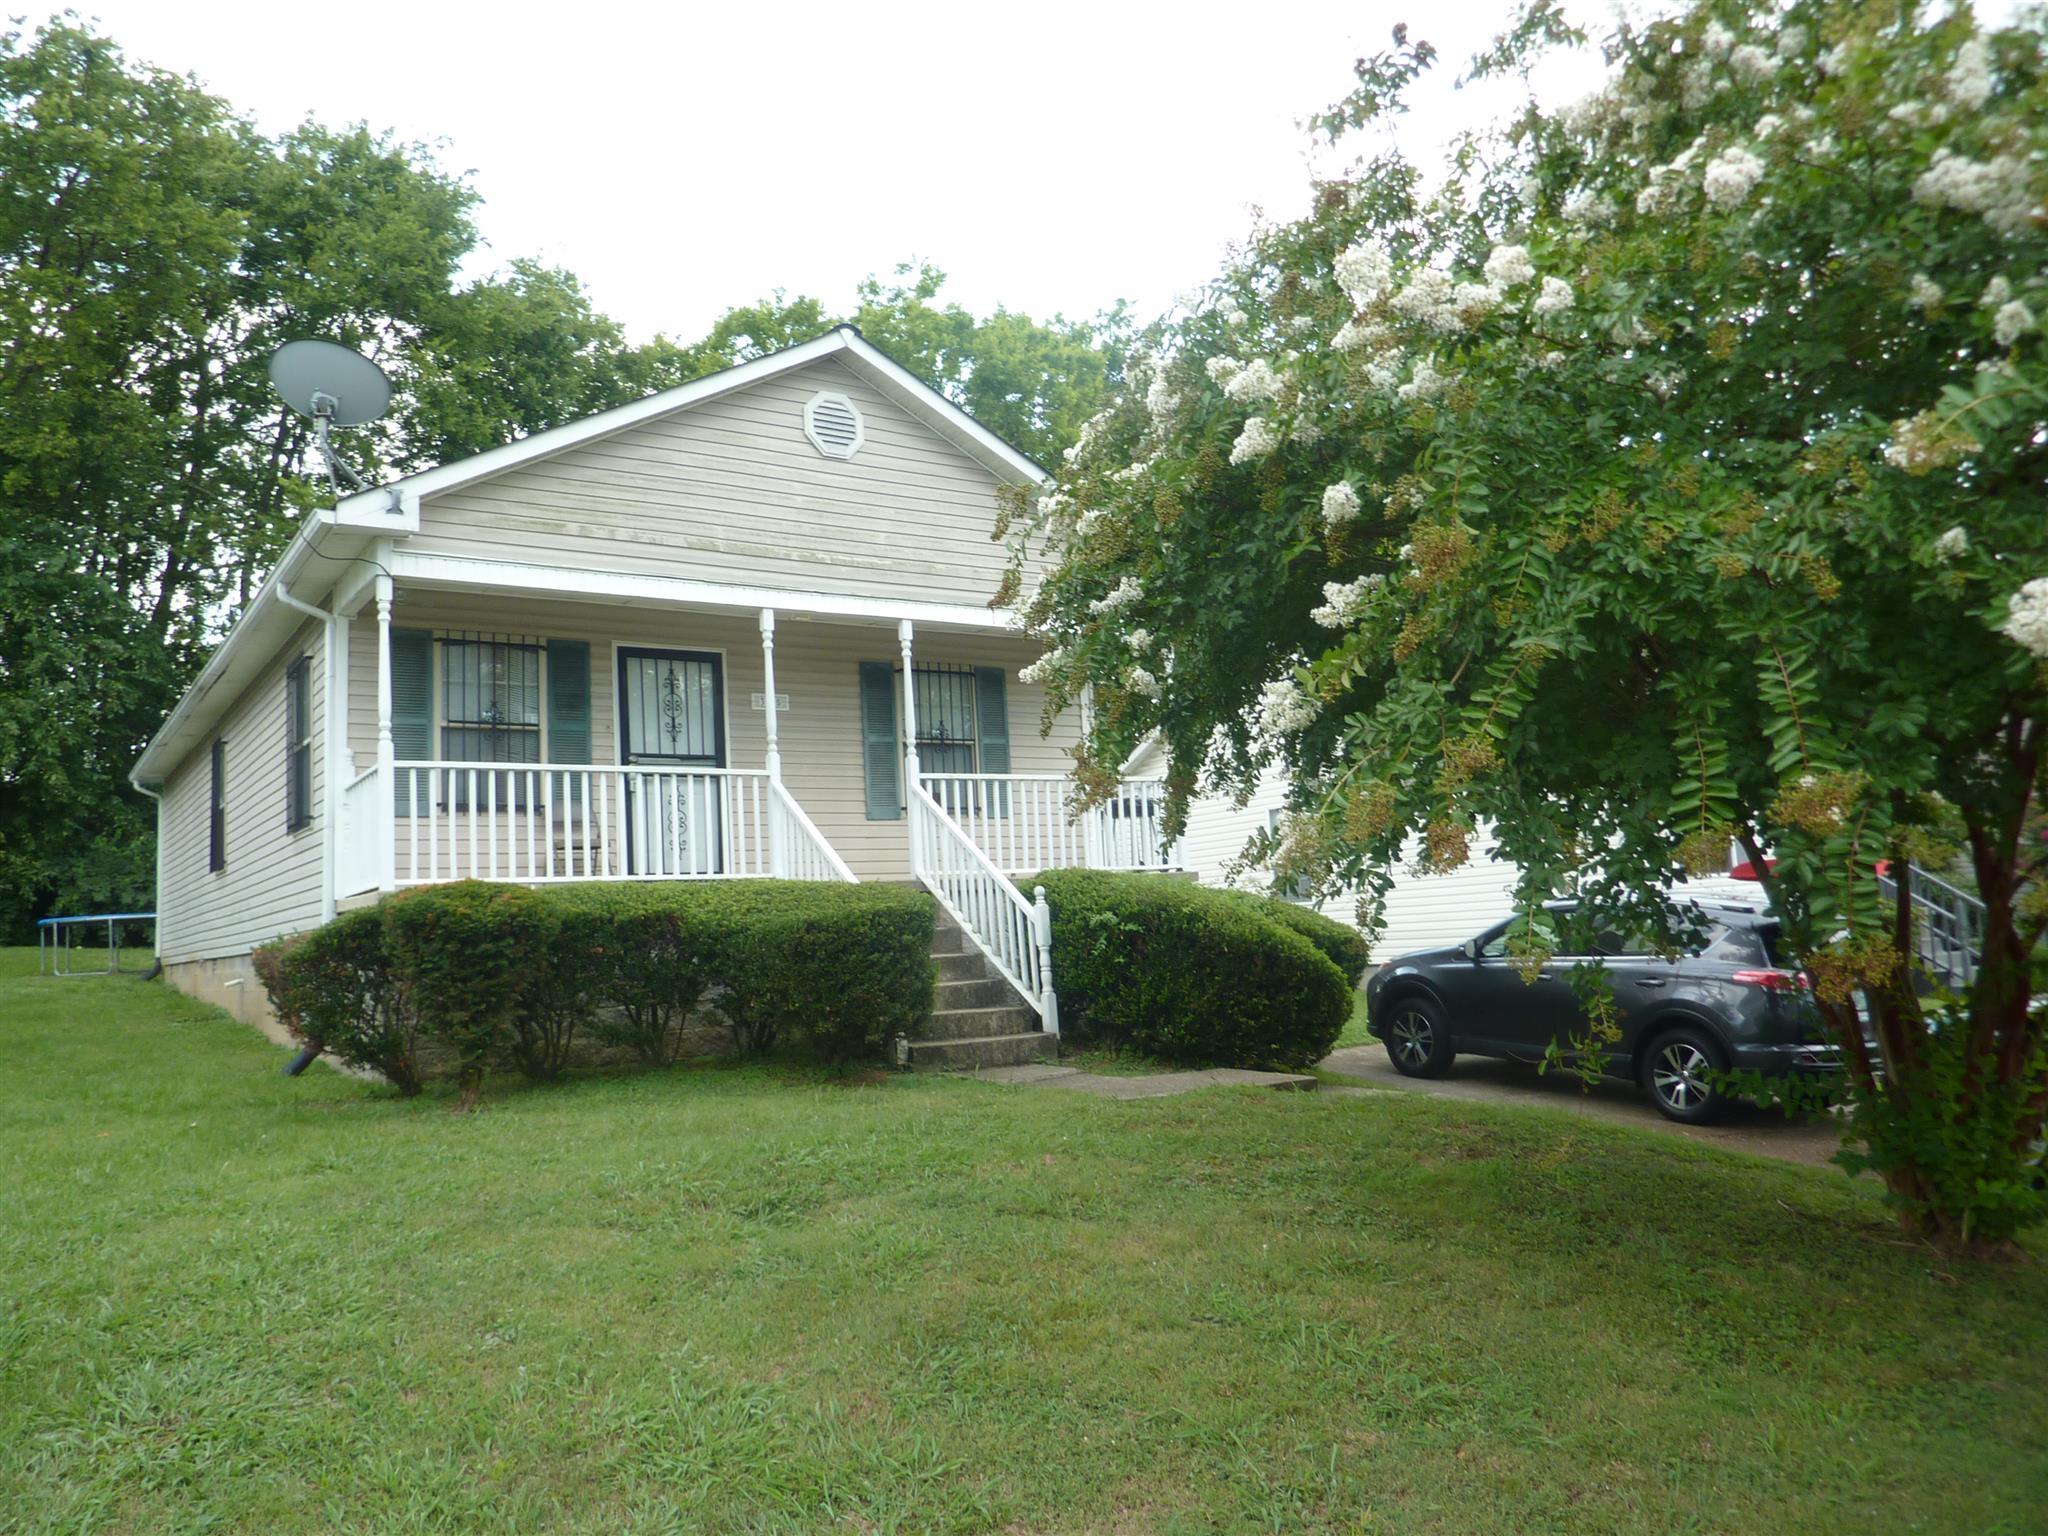 3505 Rainwood Dr, Nashville, TN 37207 - Nashville, TN real estate listing